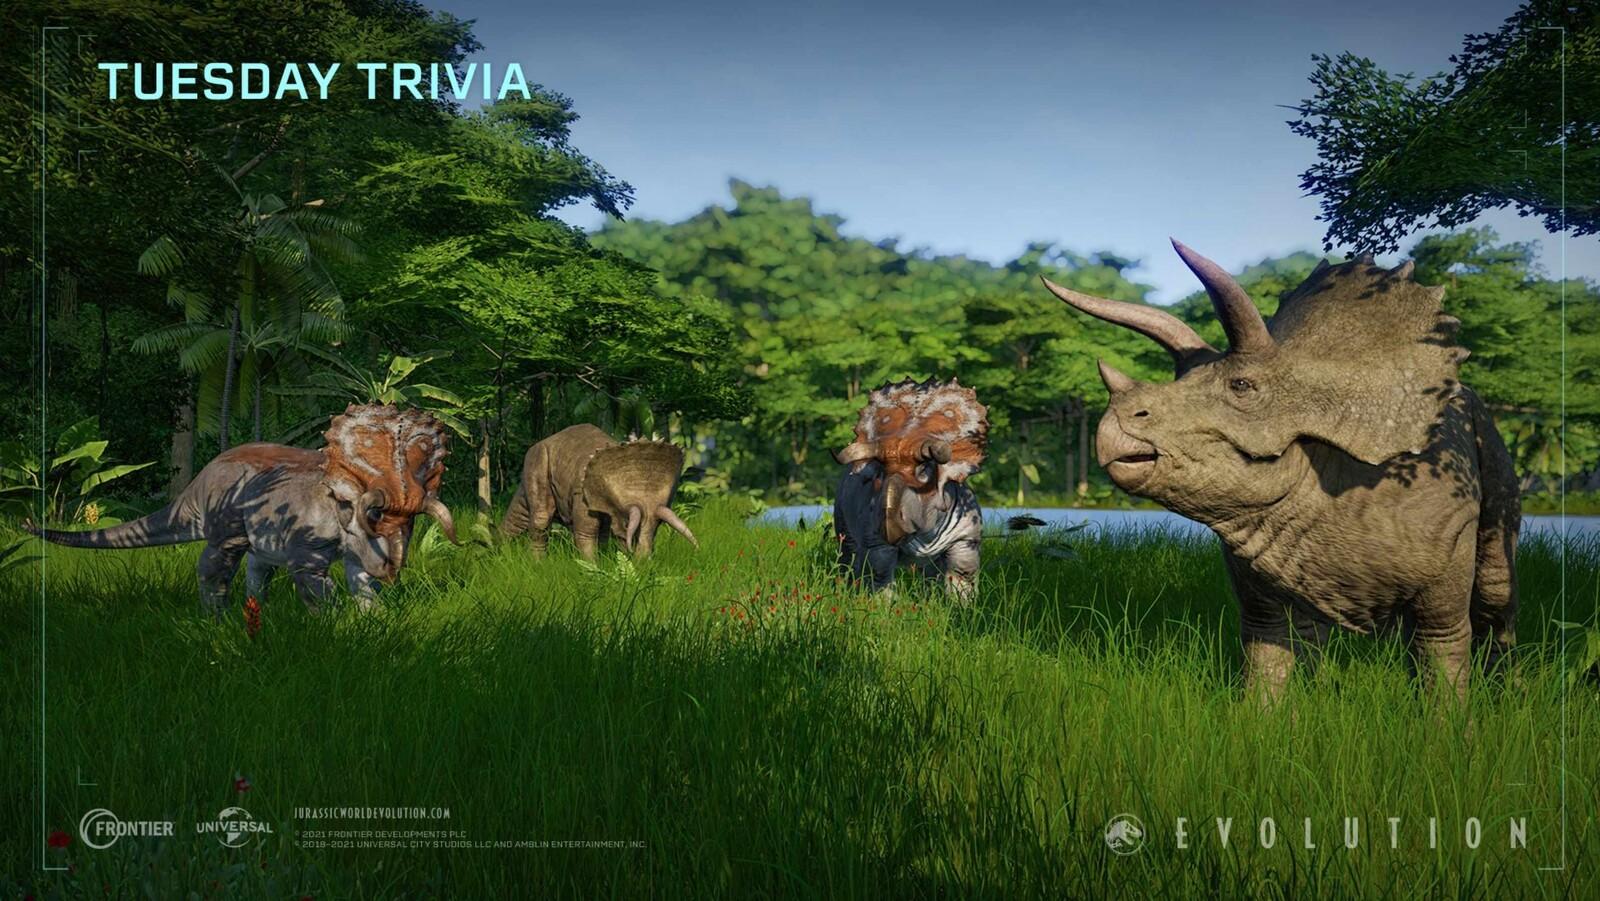 Jurassic World Evolution - Tuesday Trivia Triceratops